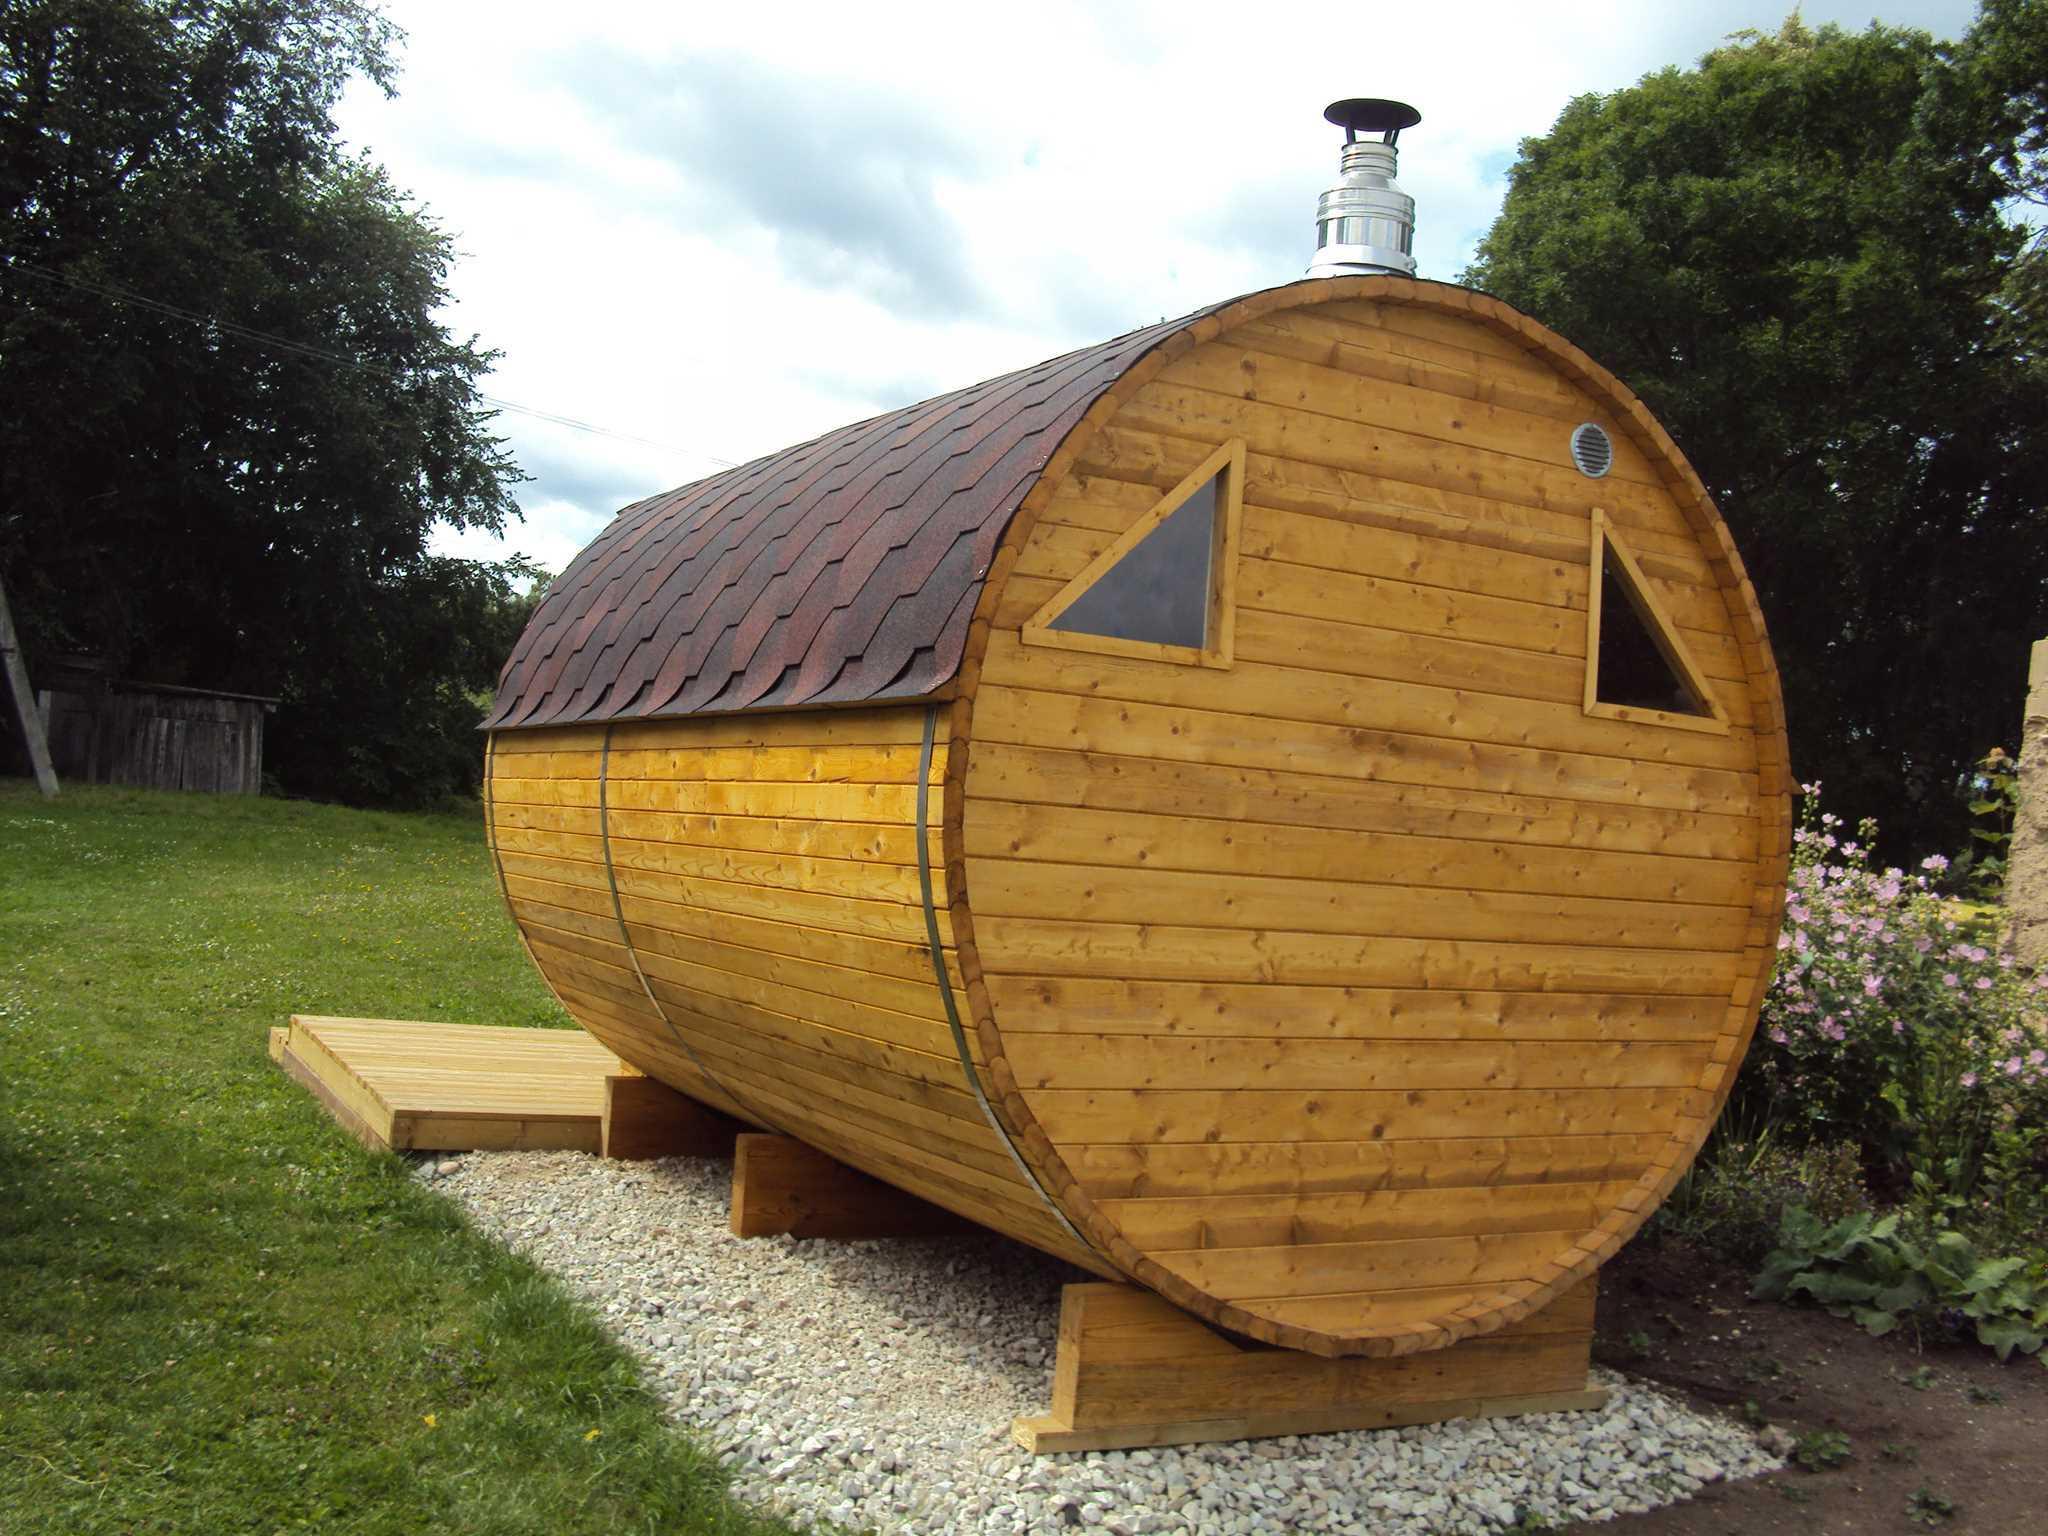 Tarif sauna 3 5m 2 pieces chauffage au bois saunas for Chauffage piscine au bois